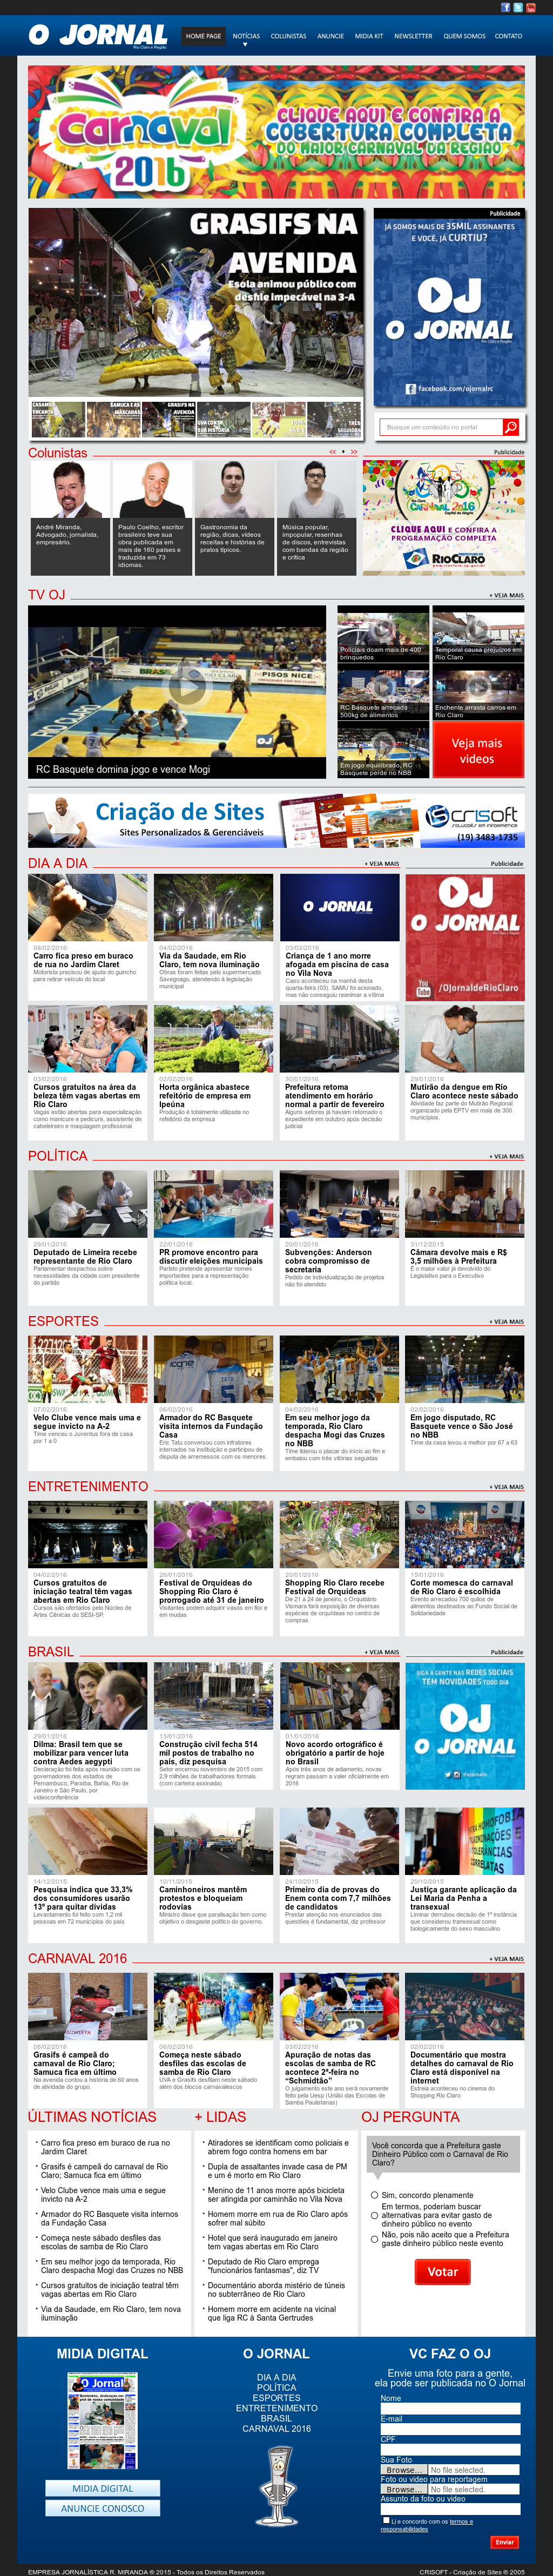 Jornalrioclaro Competitors, Revenue and Employees - Owler